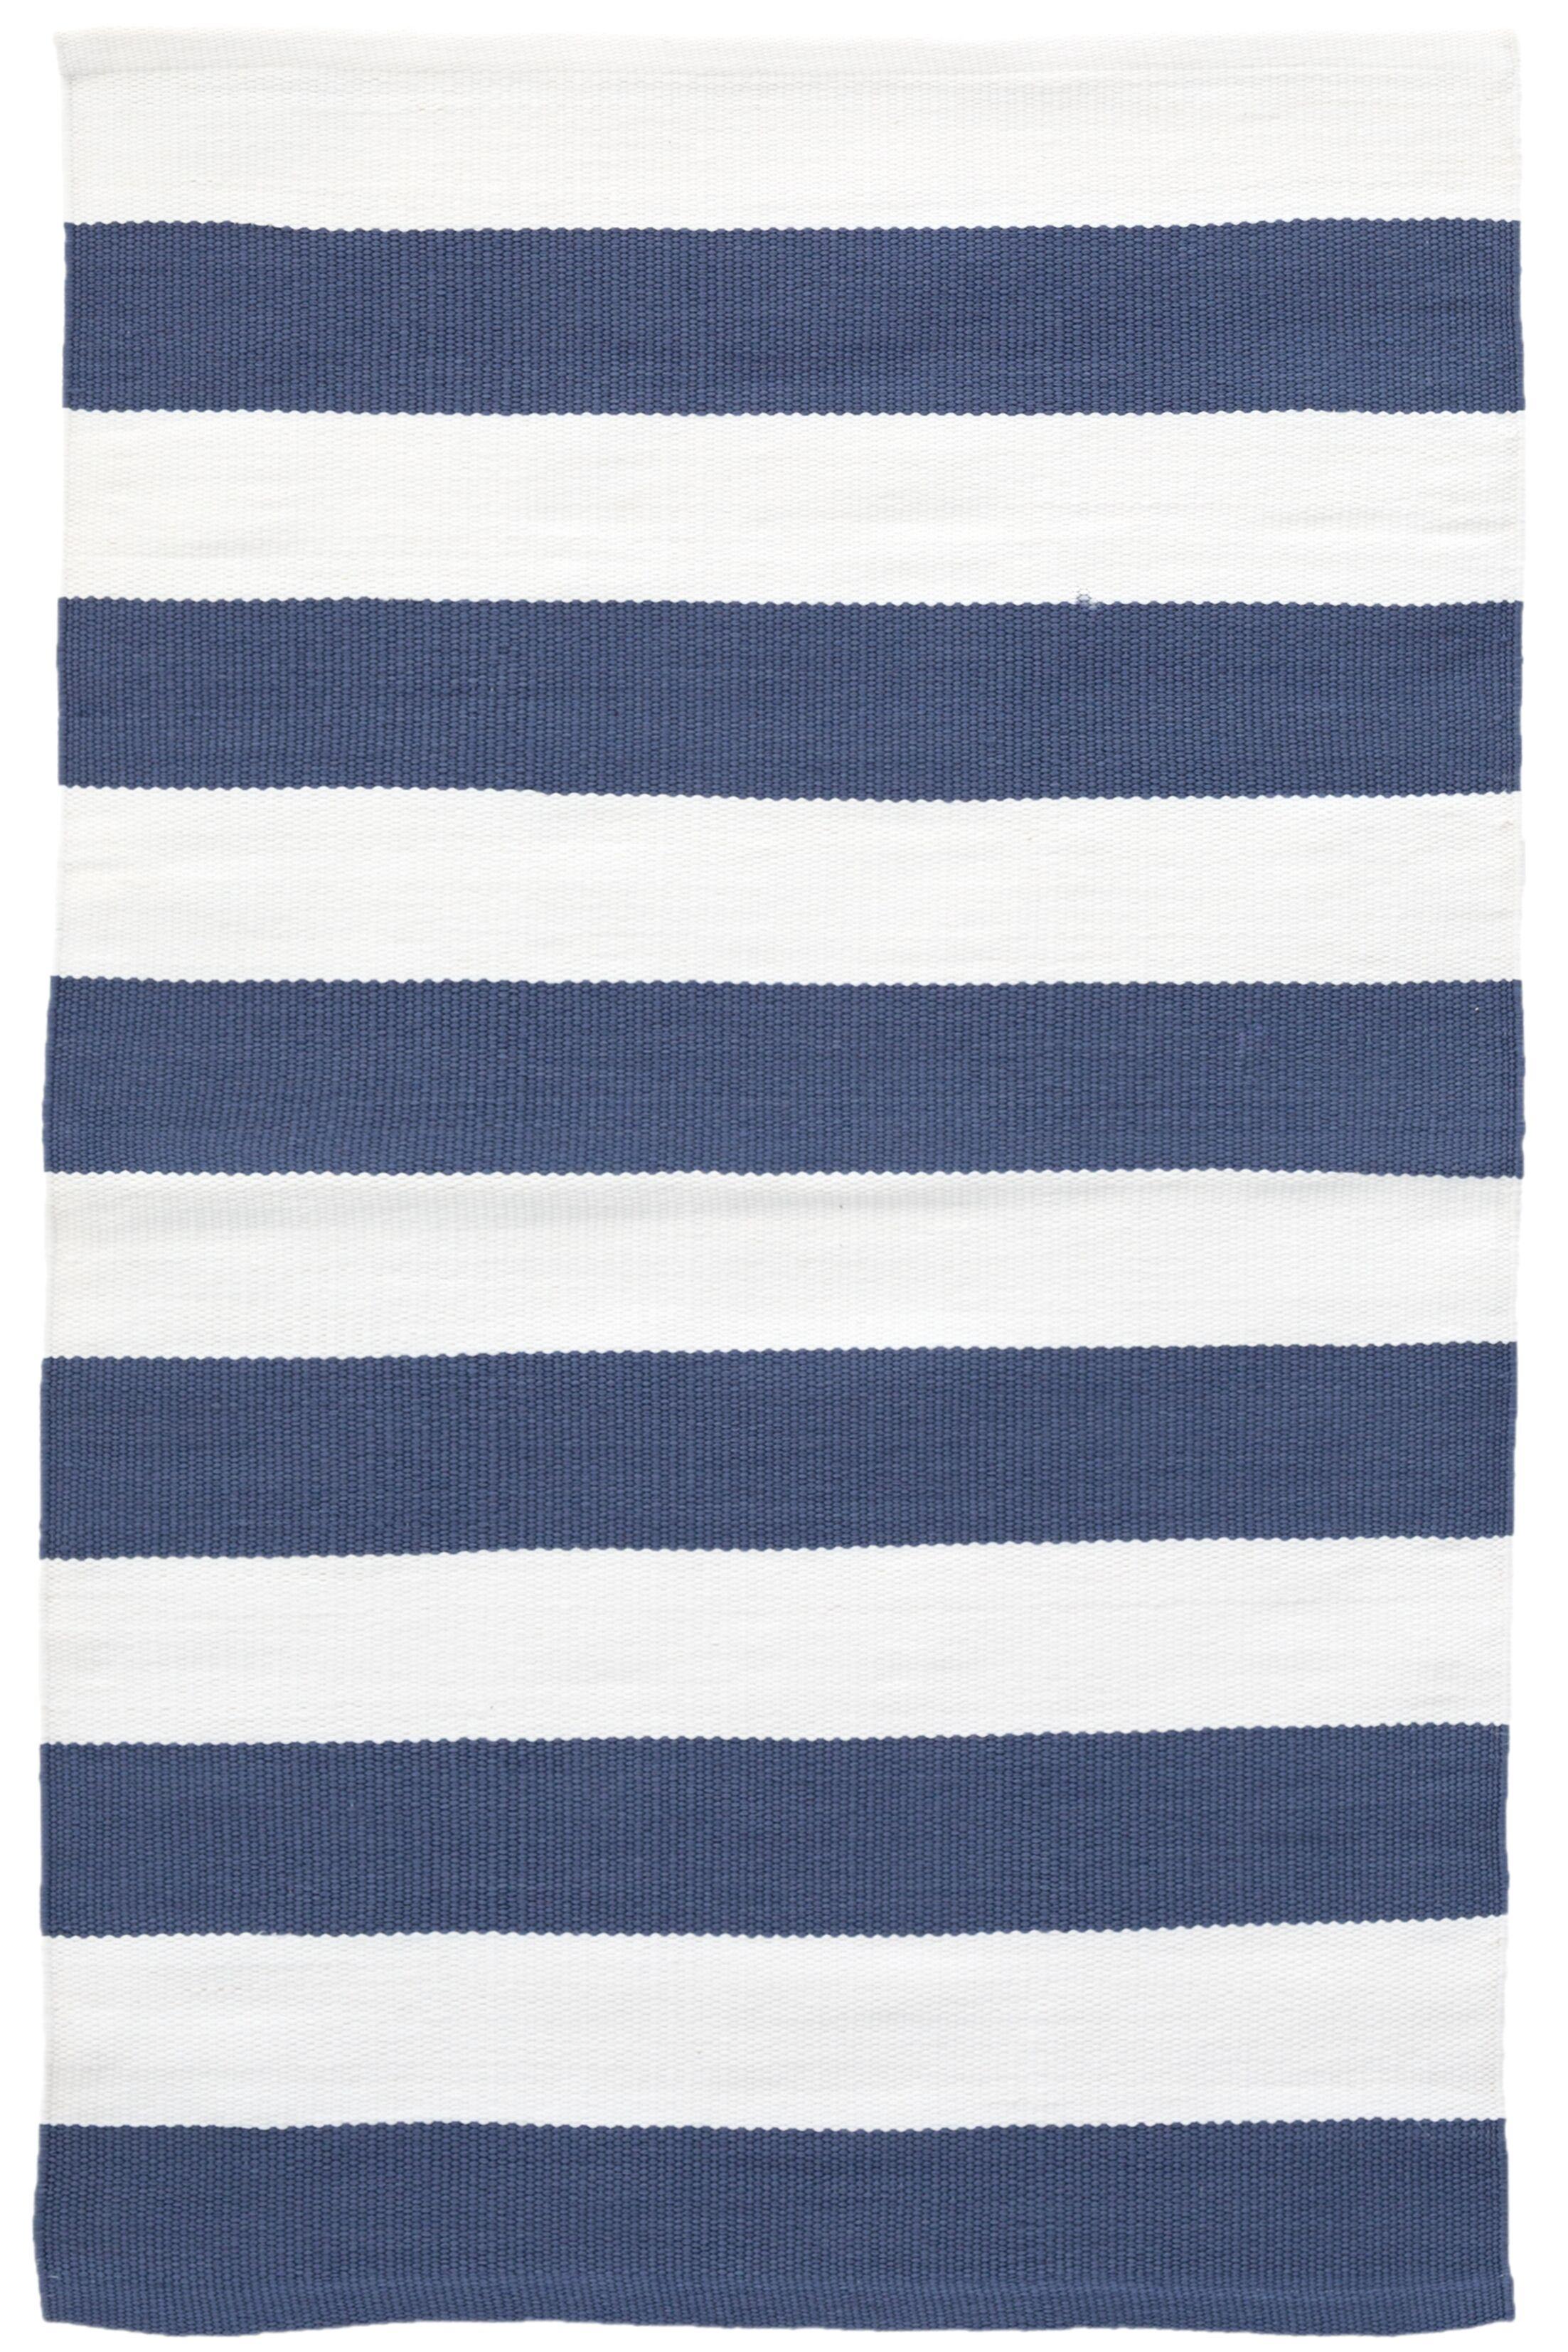 Catamaran Stripe Blue/White Indoor/Outdoor Area Rug Rug Size: 6' x 9'